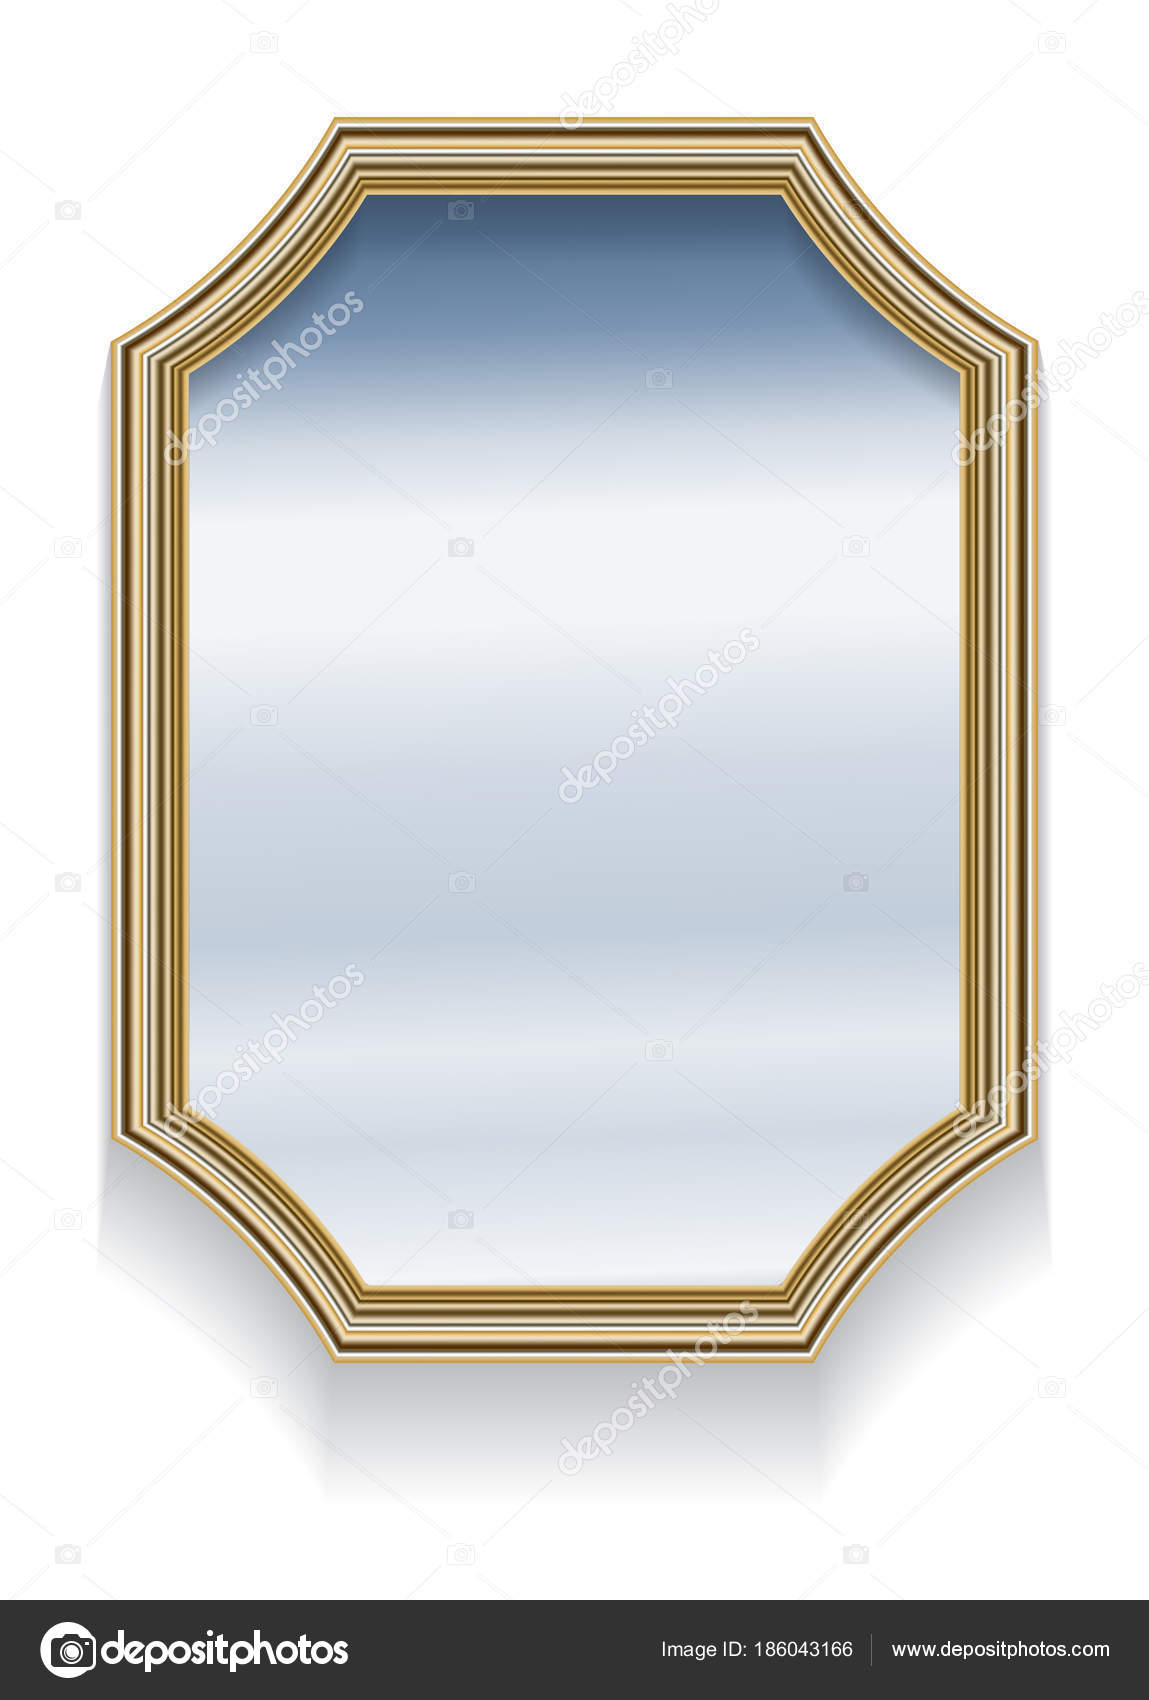 Spiegel im Retro-Rahmen aus Holz — Stockvektor © antonshpak #186043166